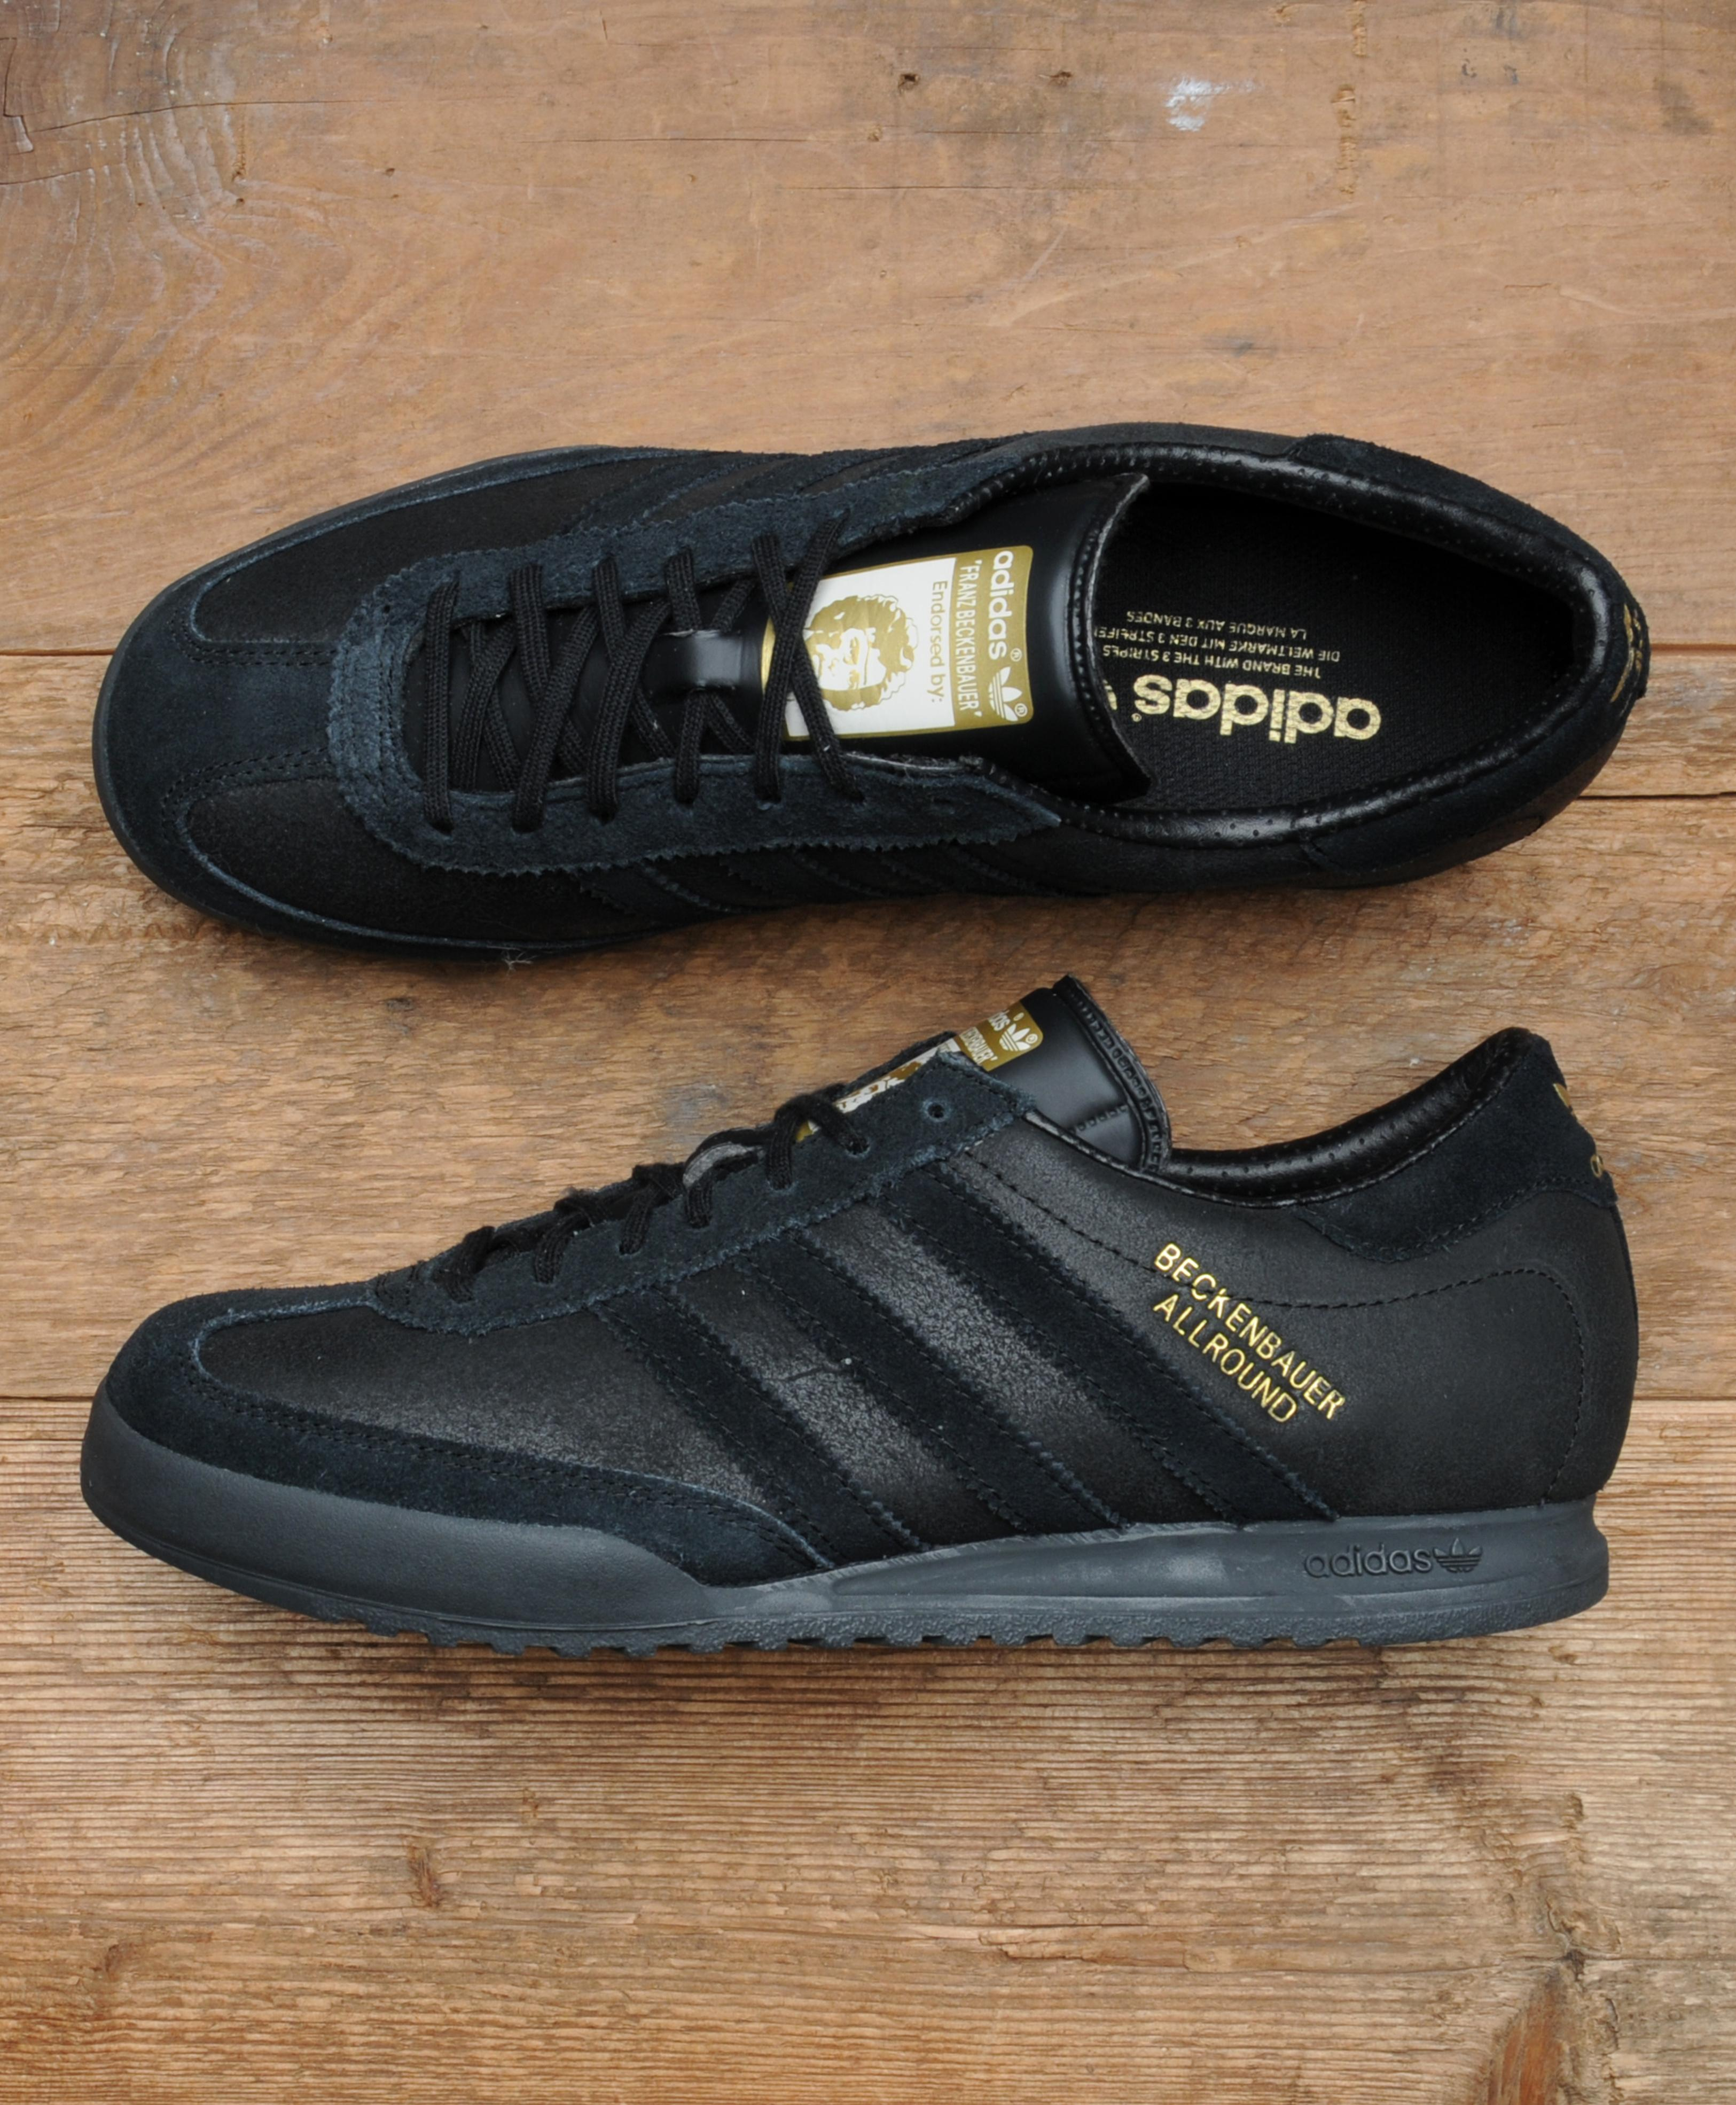 Originals Scarpe Adidas Franz Beckenbauer Uomo ASxxHgwq1